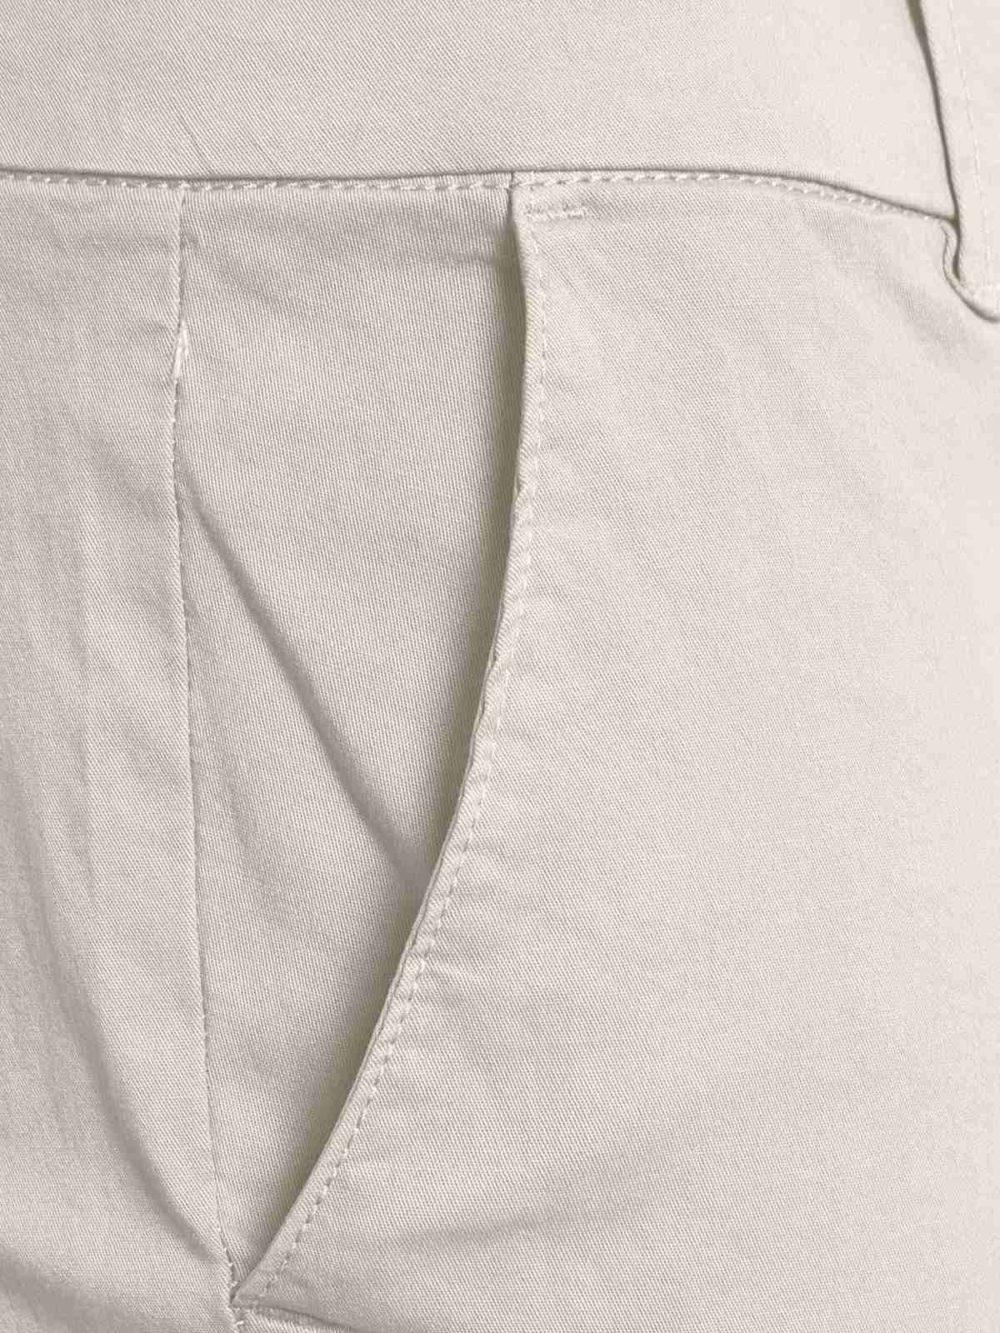 Soffy Pants Part Two Katie Kerr Women's Clothing